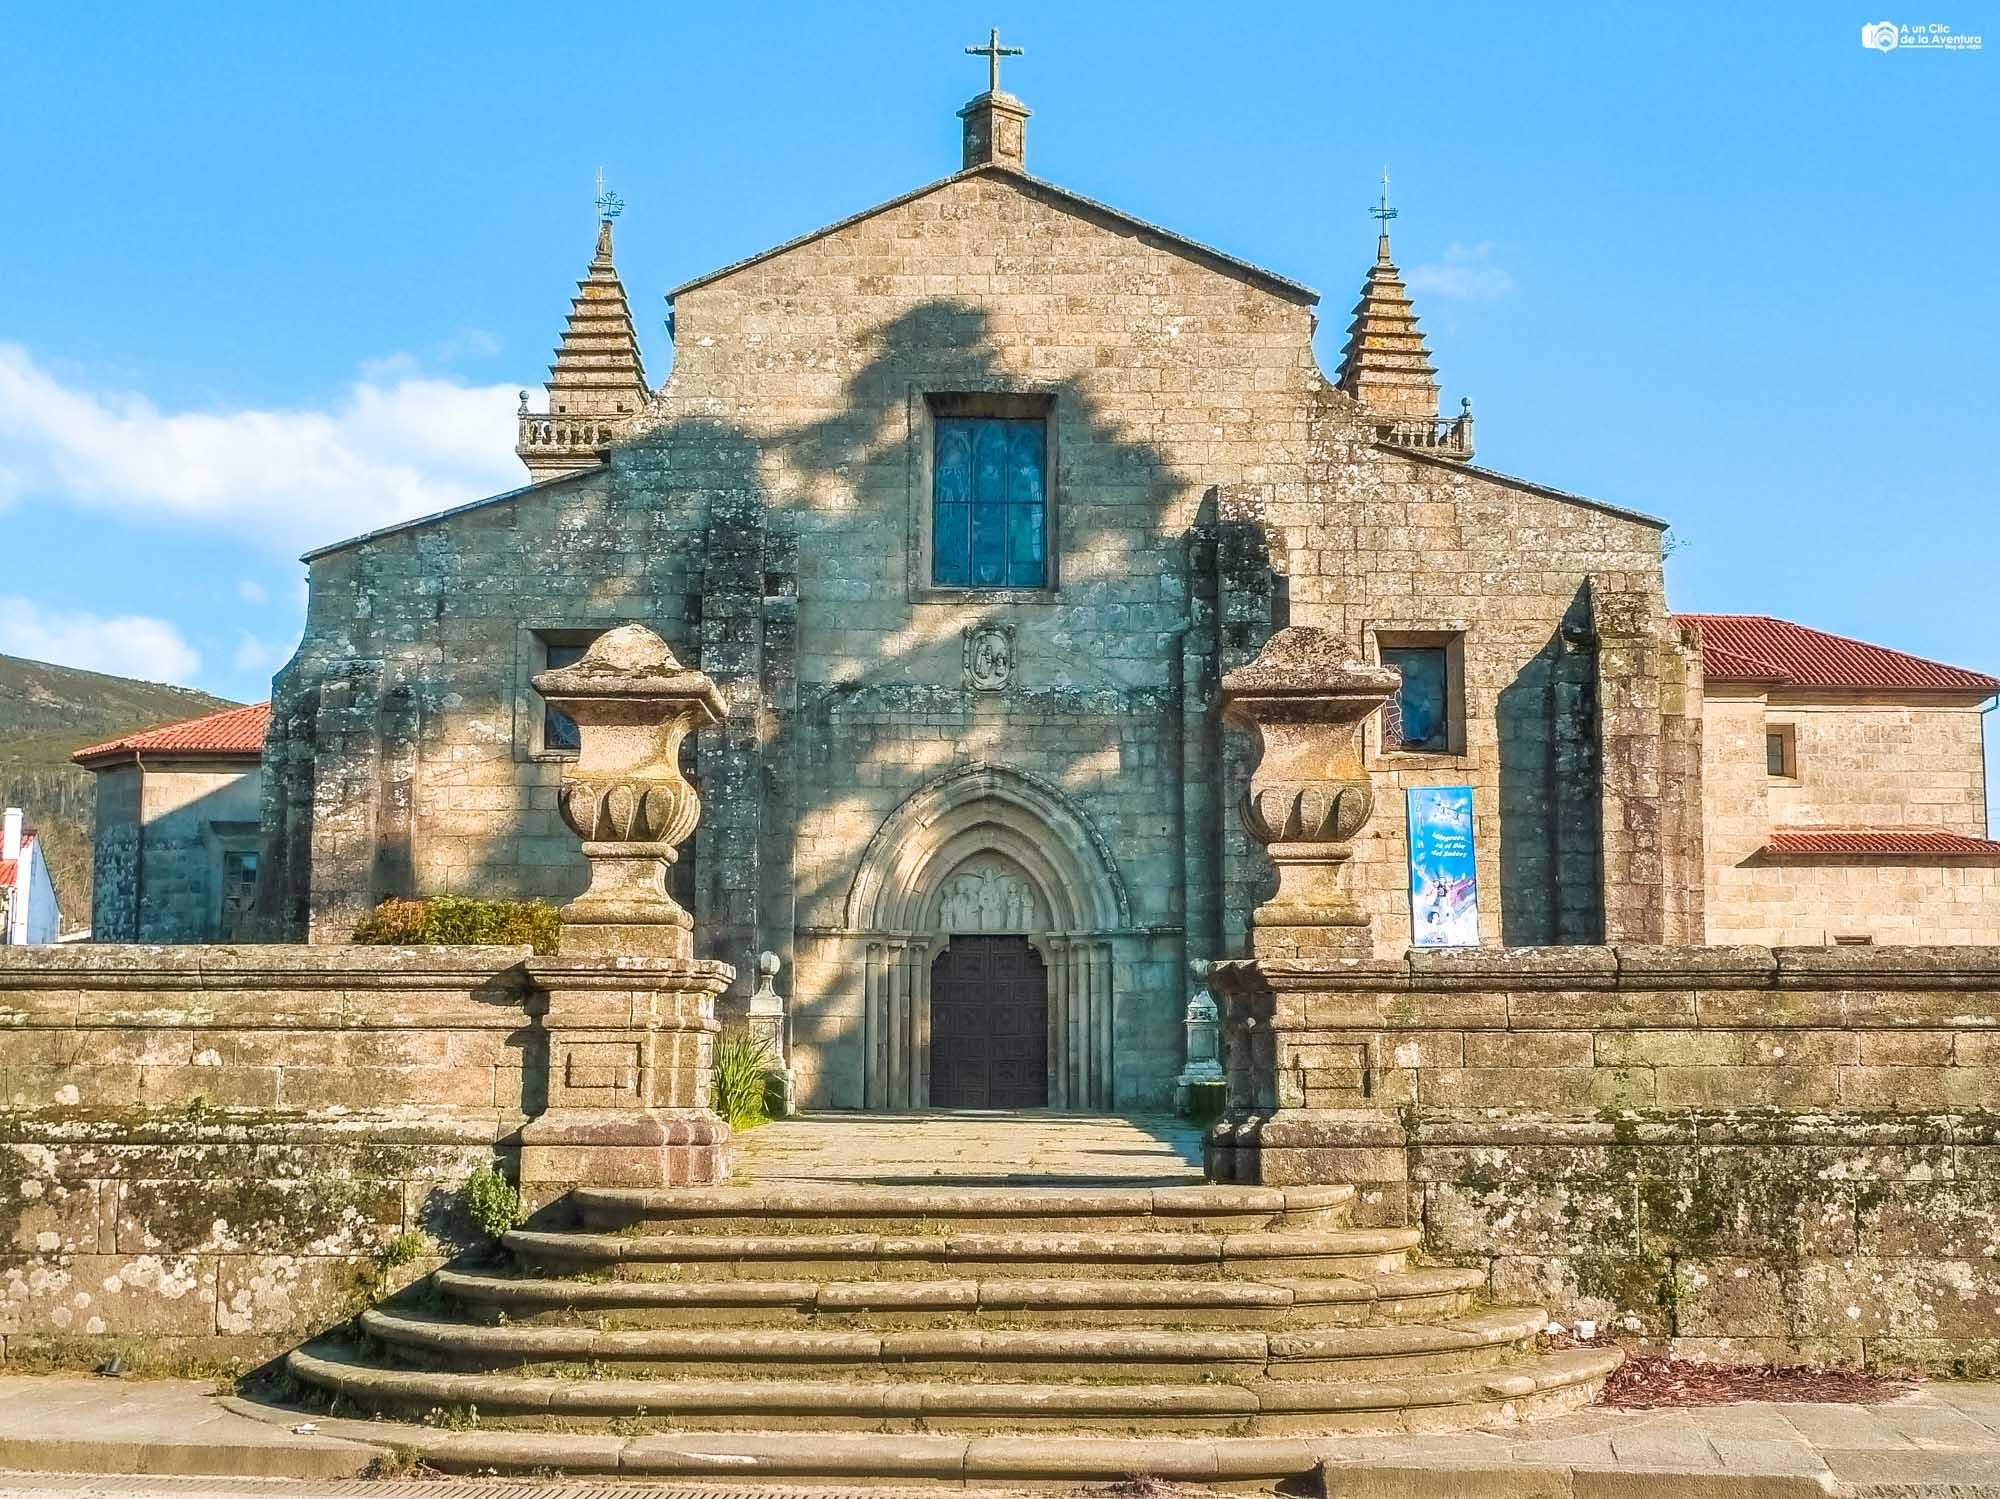 Iglesia-Colegiata de Santa María de Iria Flavia